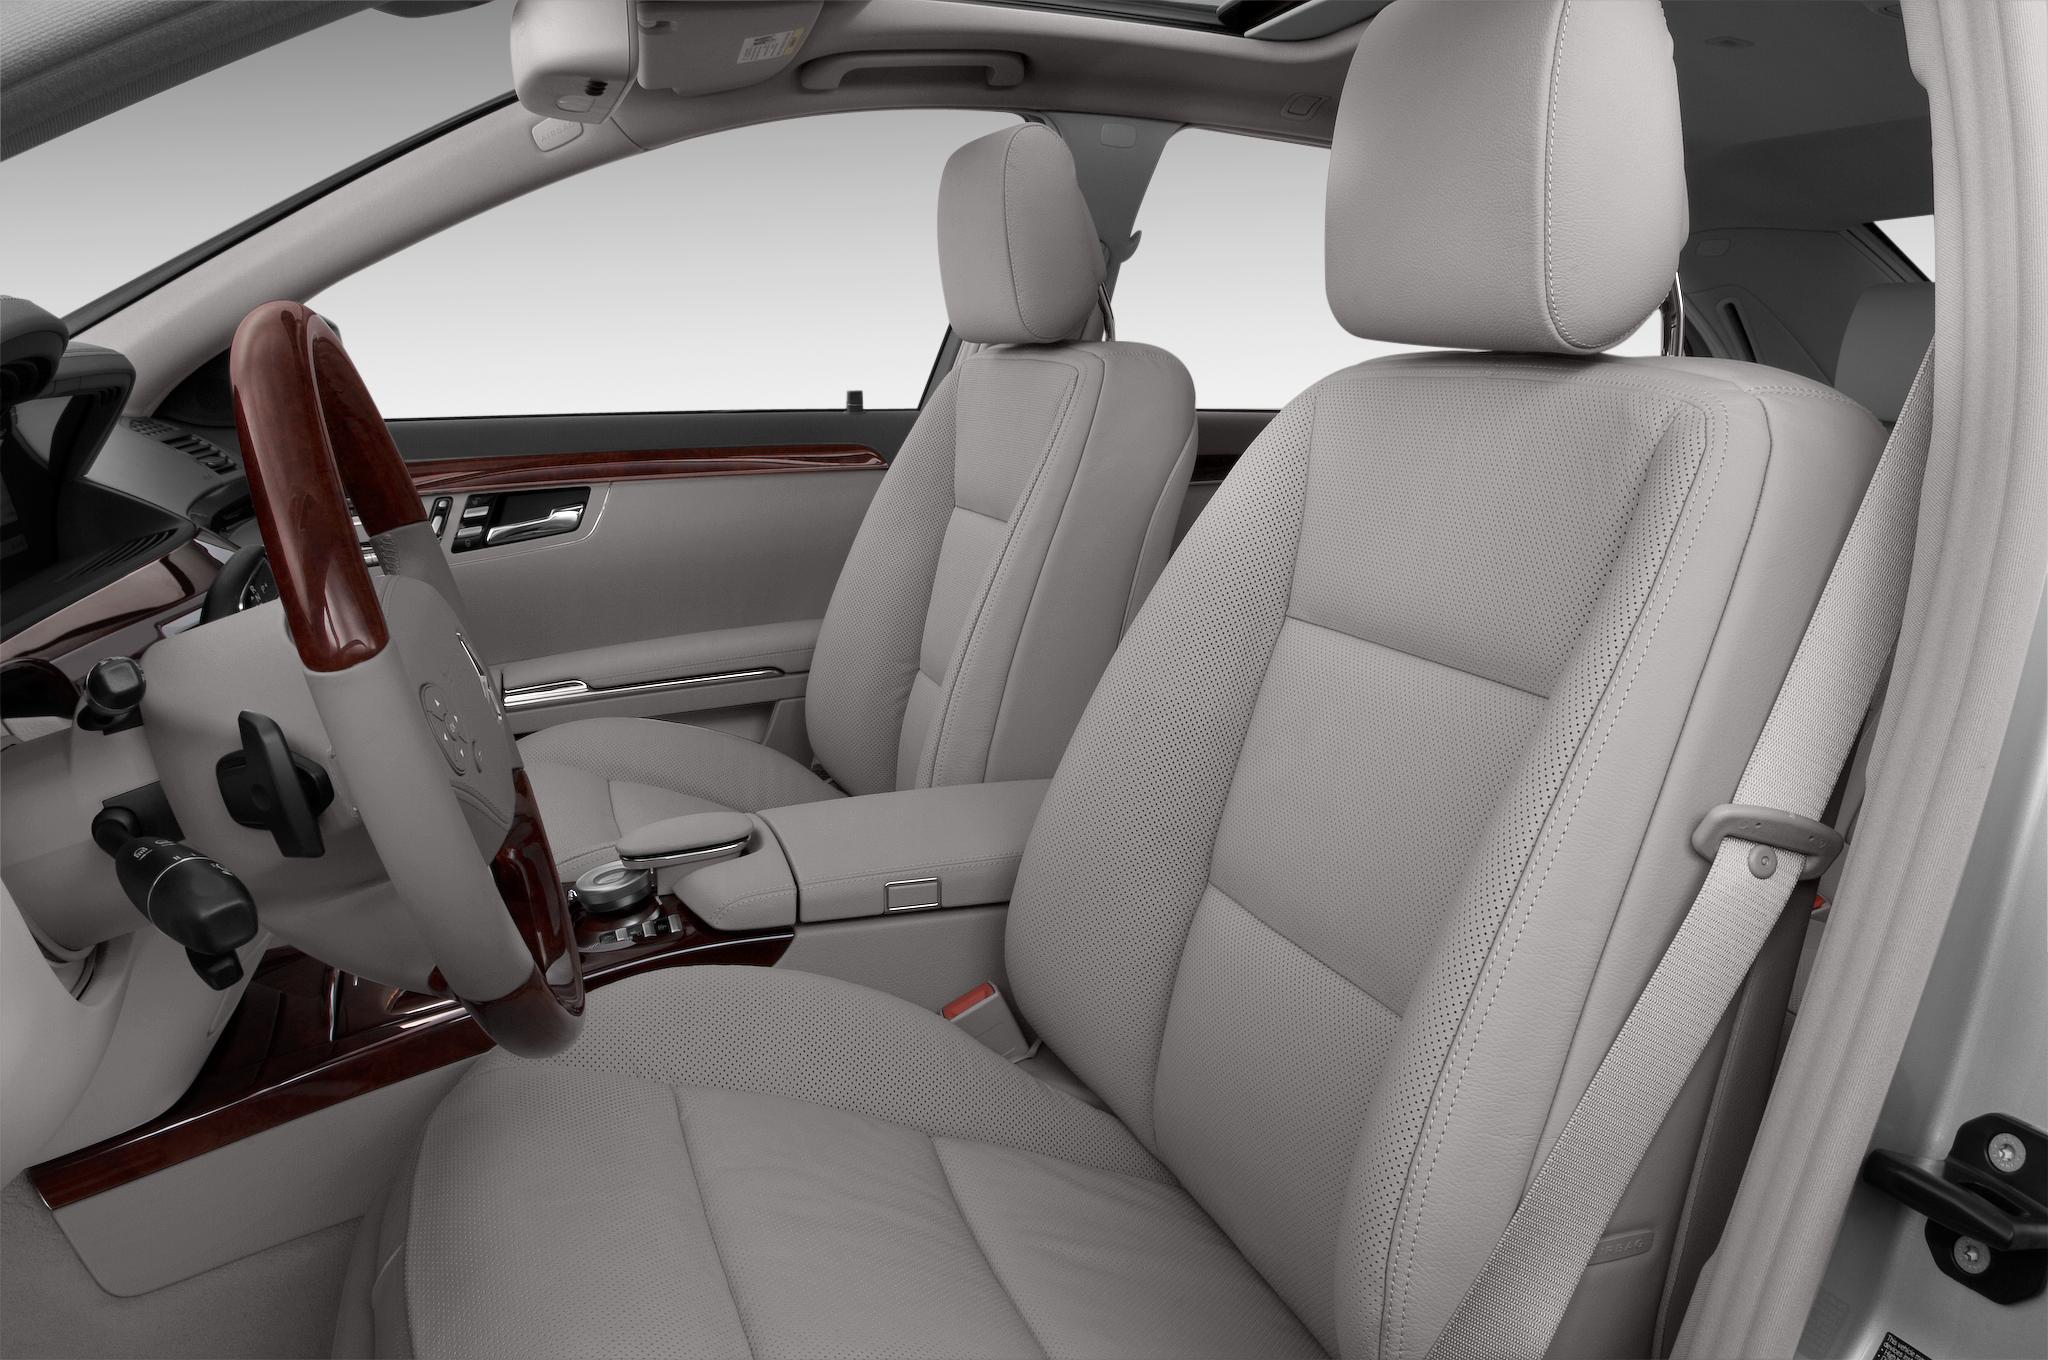 2012 Mercedes Benz S63 AMG Editors Notebook Automobile Magazine